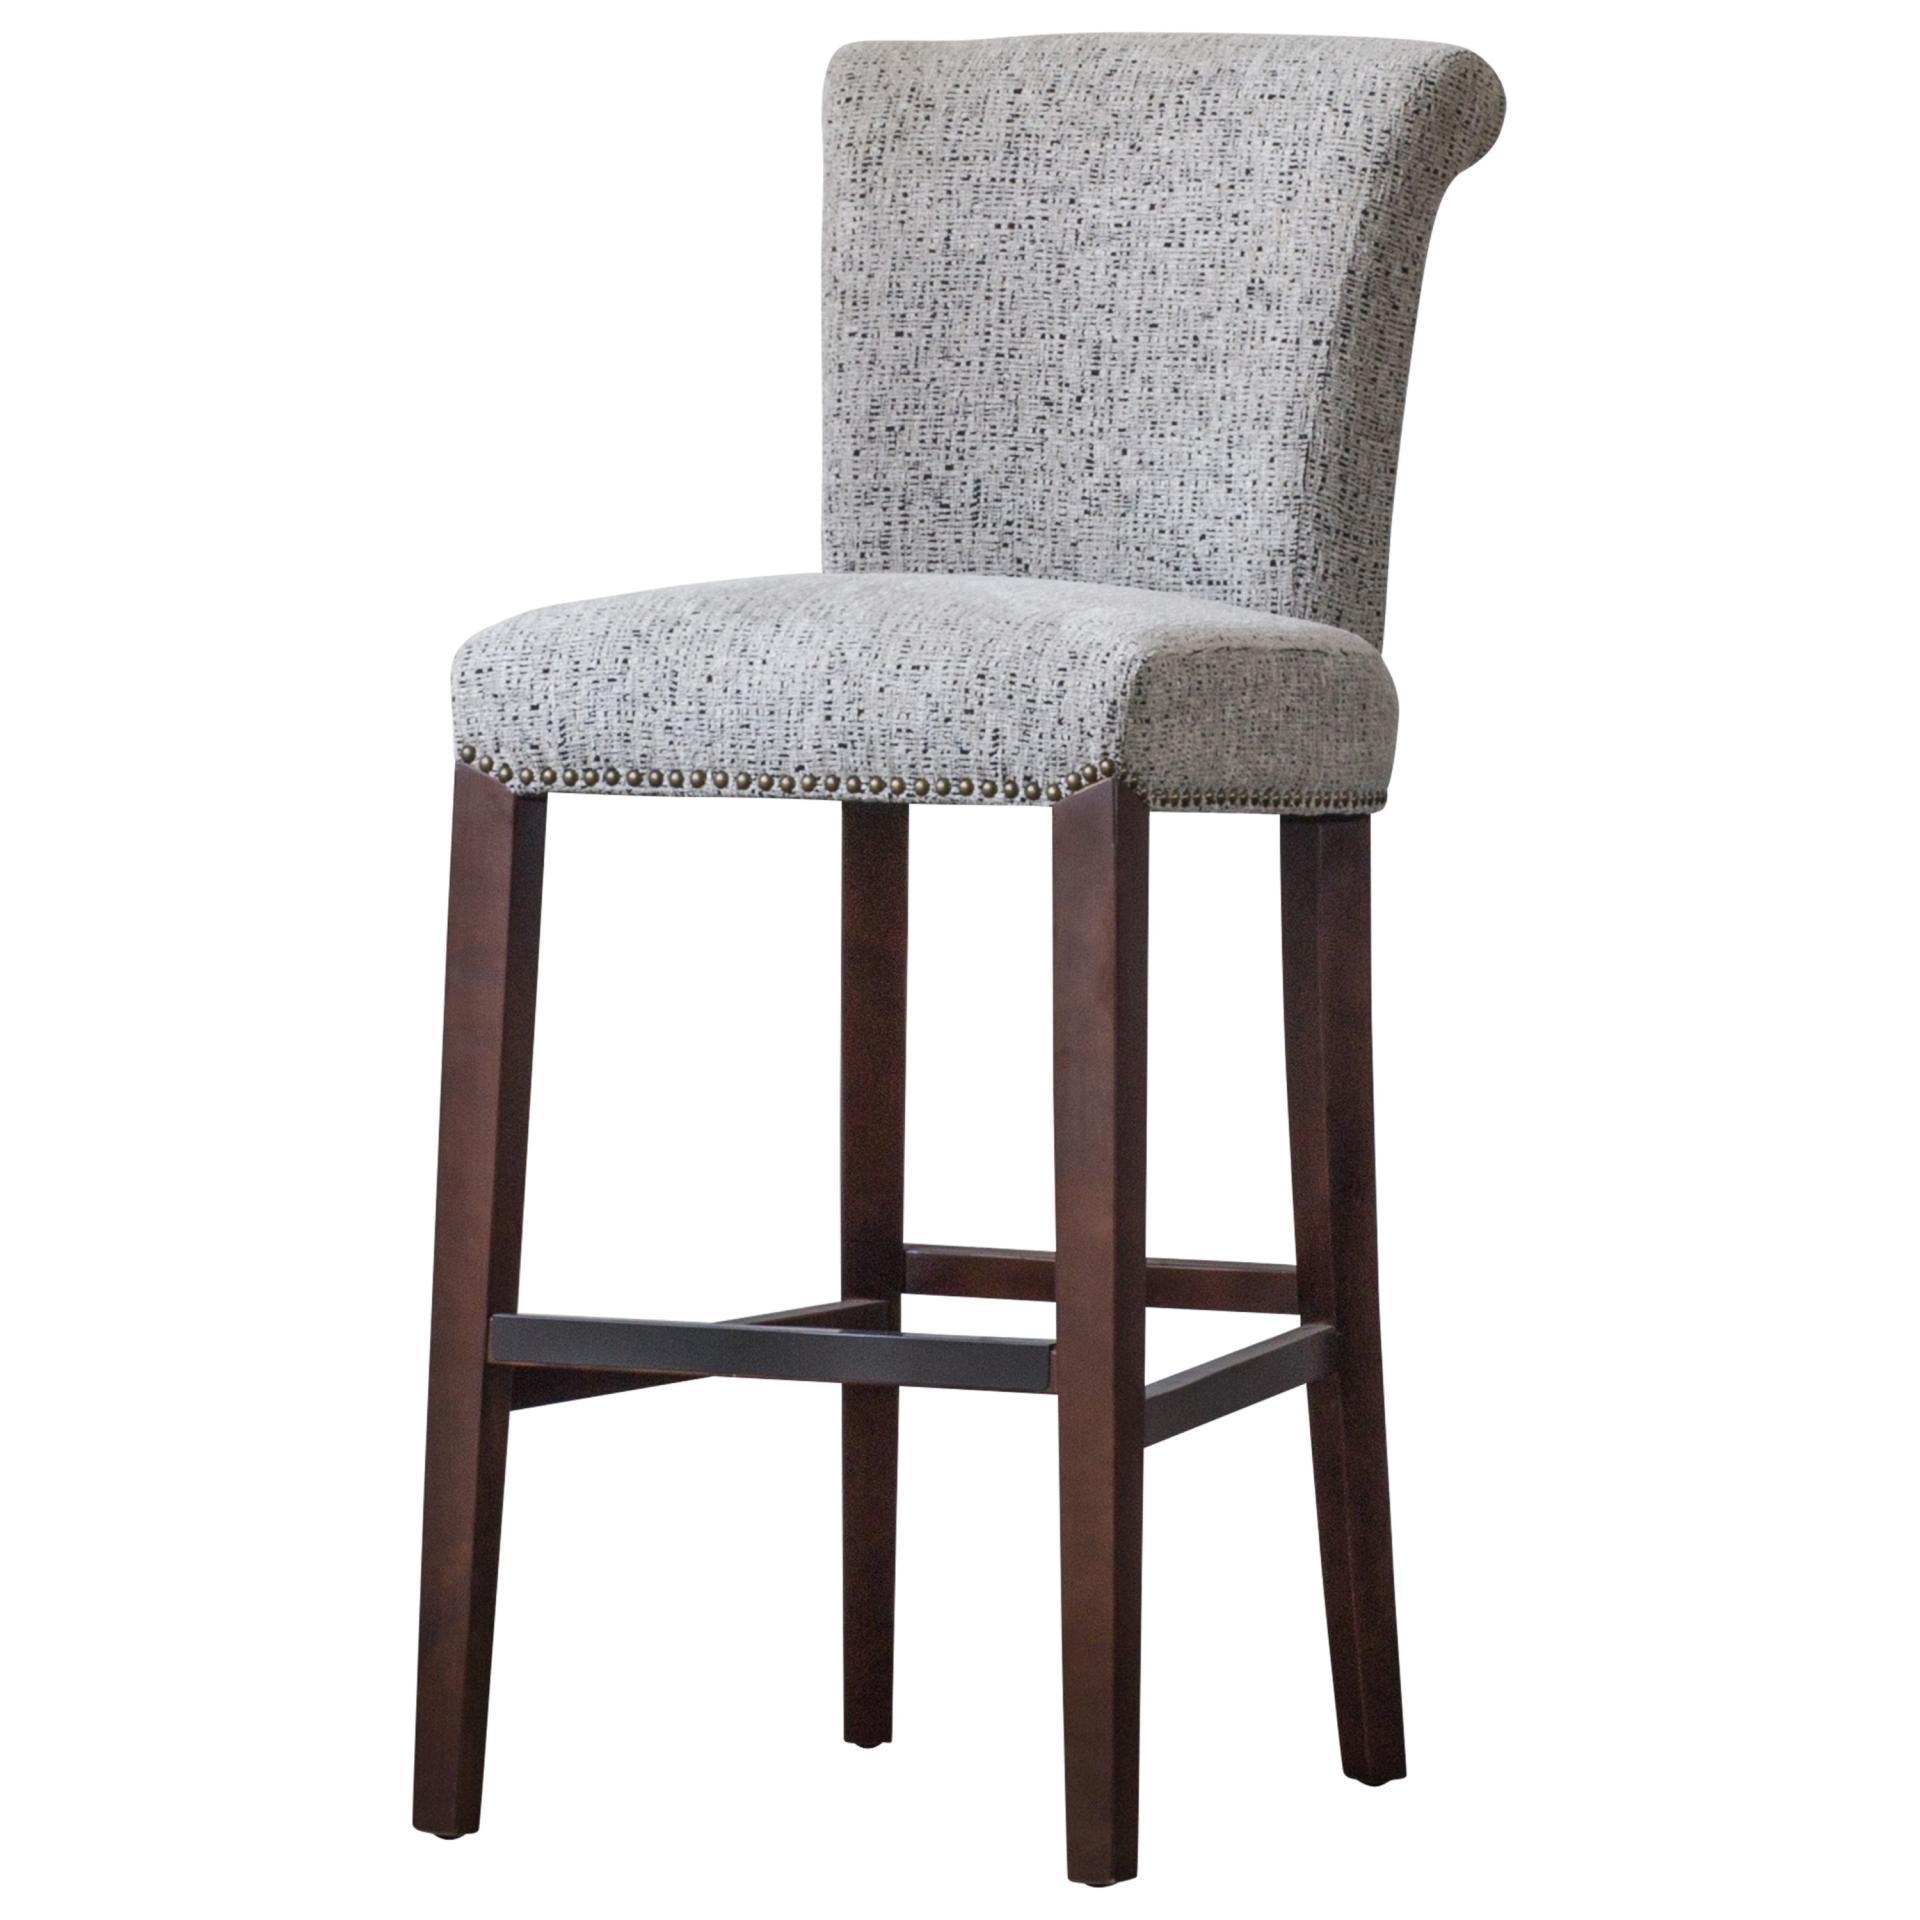 1900106 328 Npd Home Furniture Wholesale Lifestyle